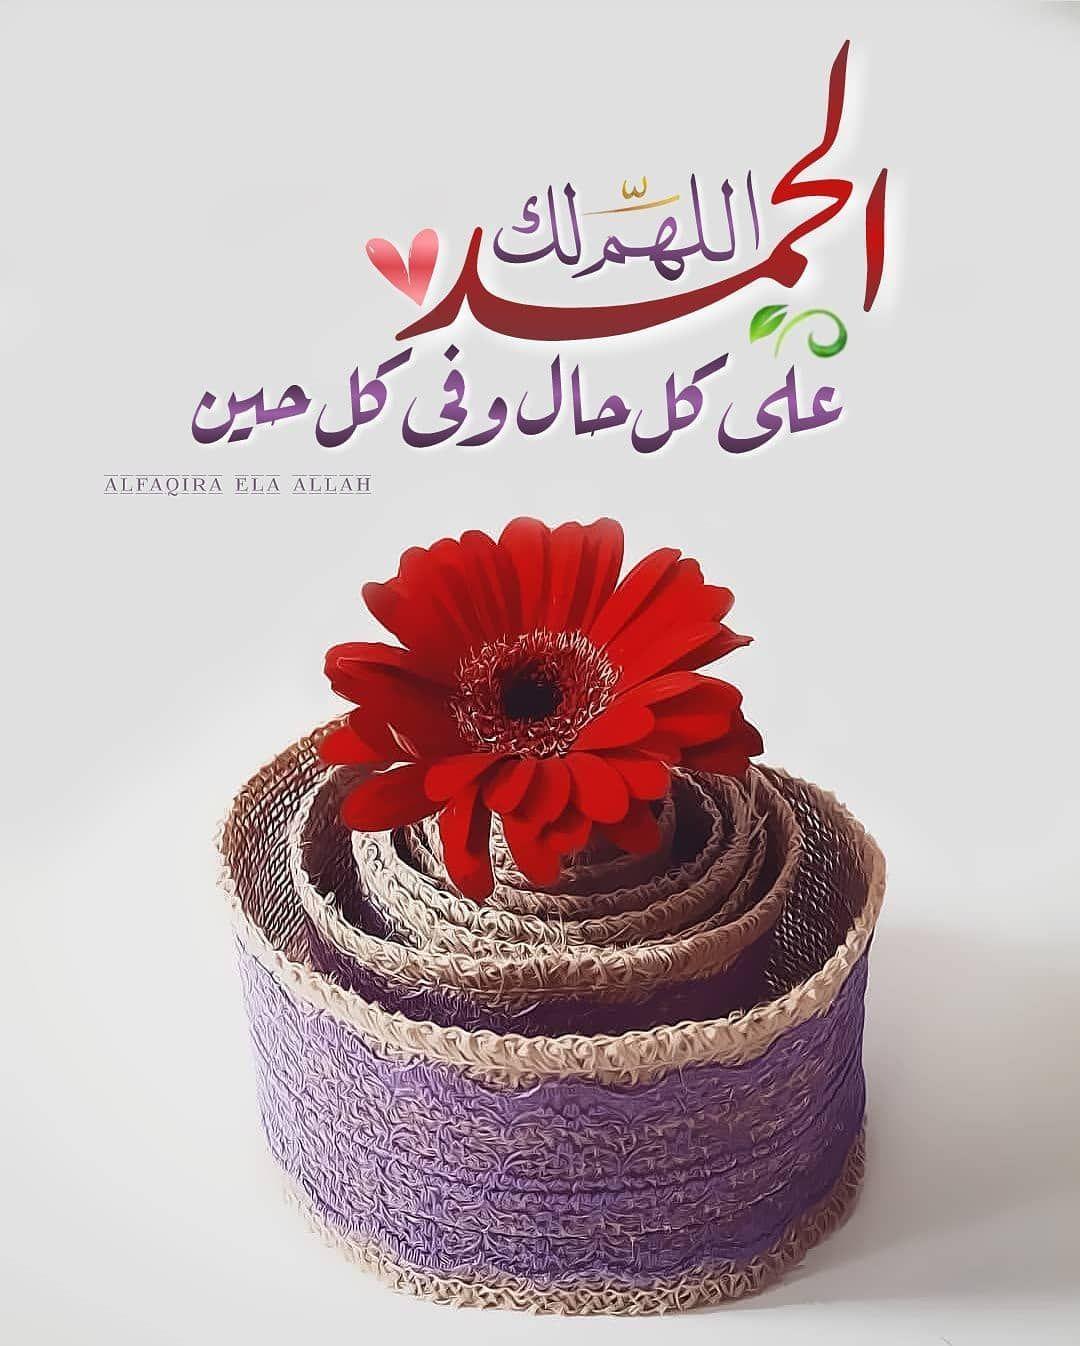 Pin By H Giro On الحمد لله Allah Islamic Qoutes Place Card Holders